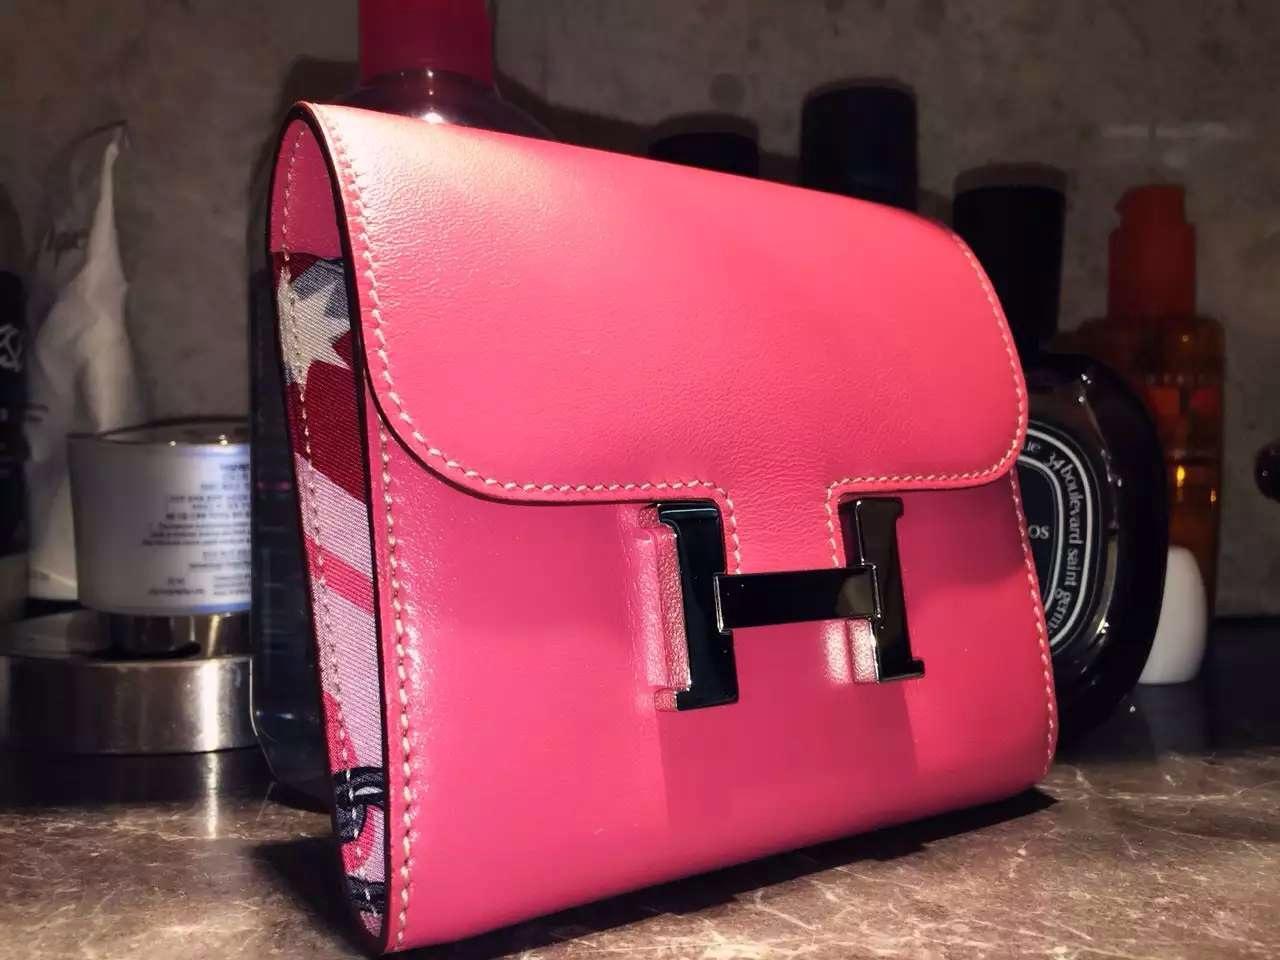 14cm Hermes Silk'in Short Constance Wallet Swift Leather Fuchsia Pink Purse